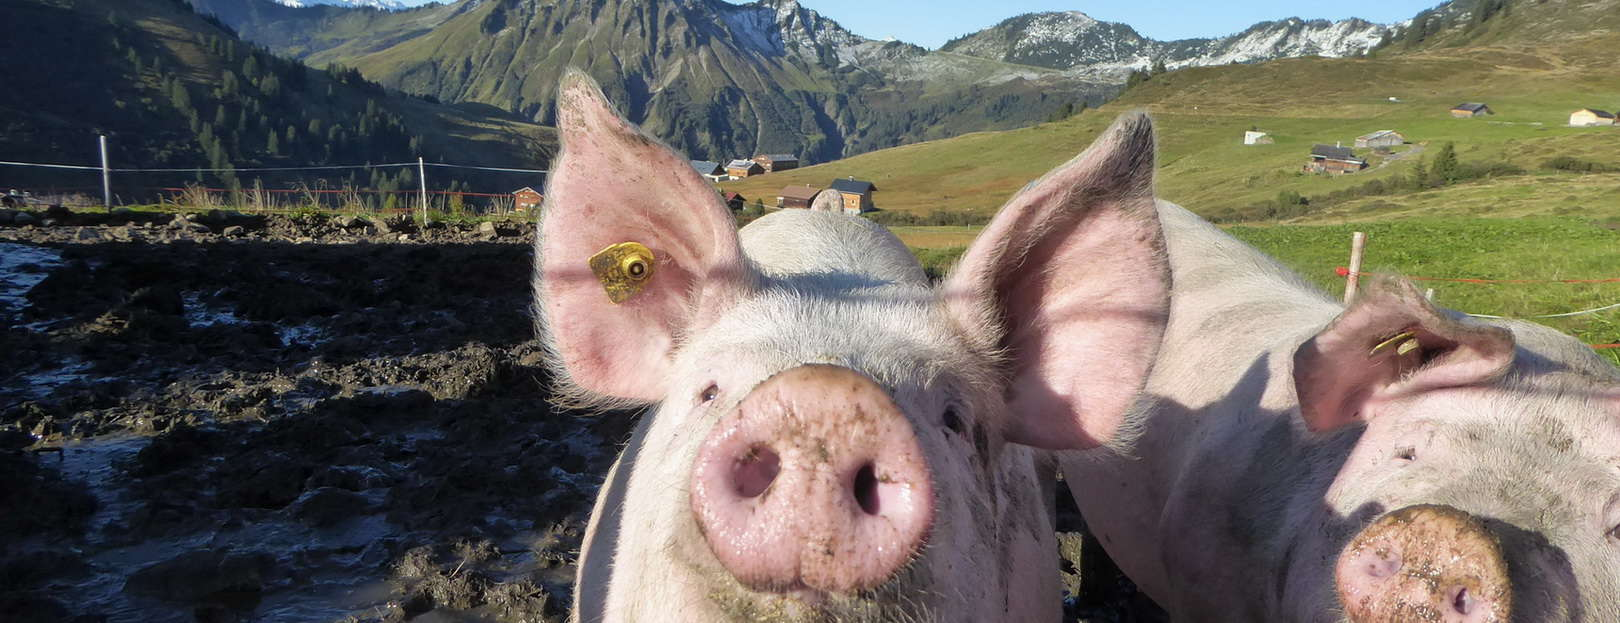 Grisar i Damüls i Österrike © Austria Travel - Rusner